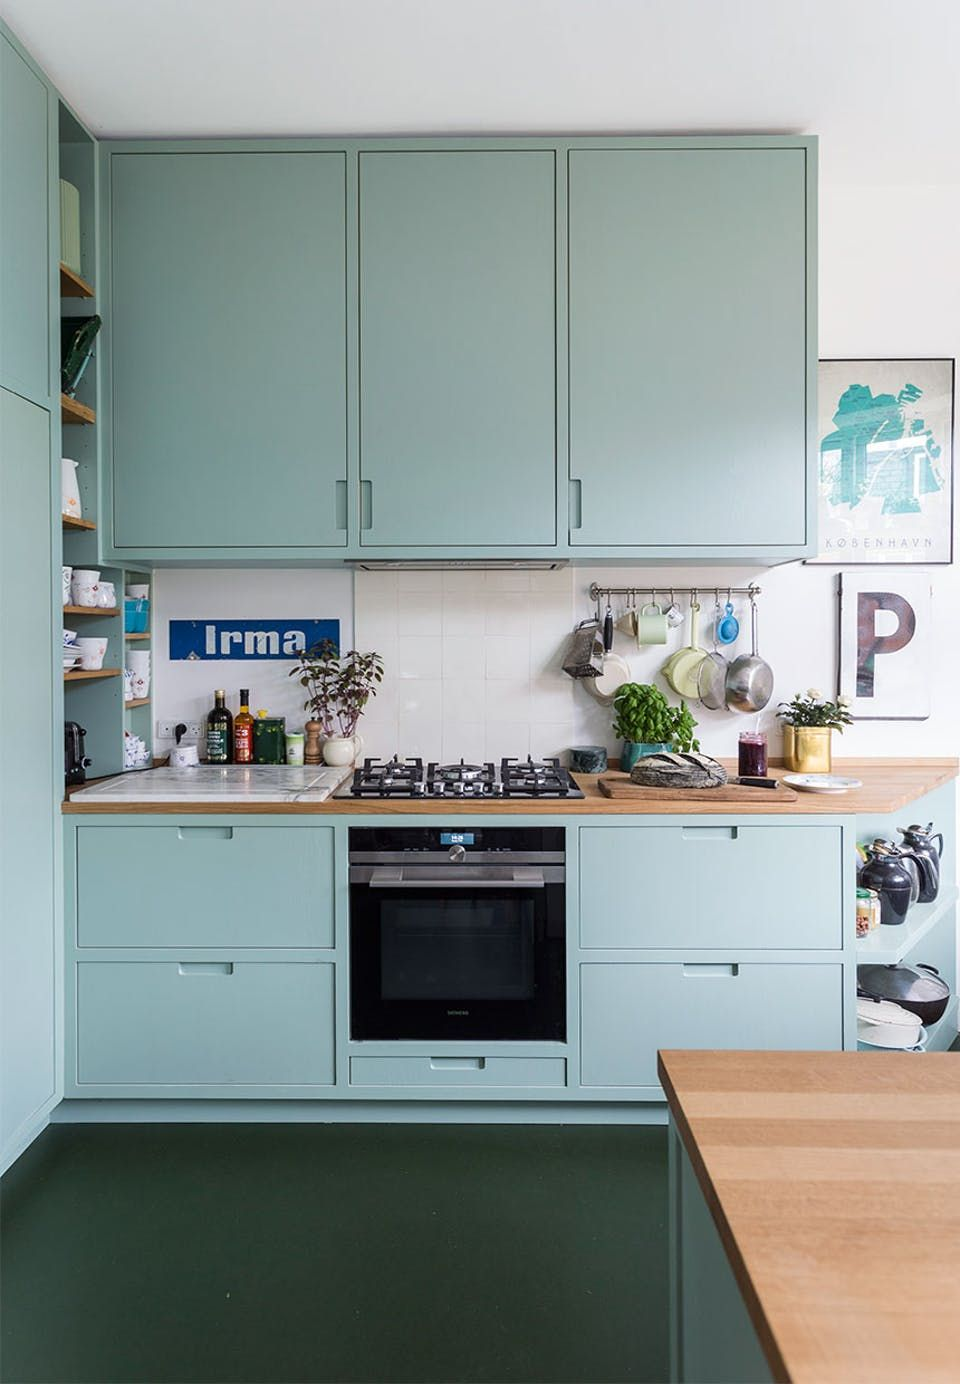 Green Color Palette Reigns in this Copenhagen Home design addict